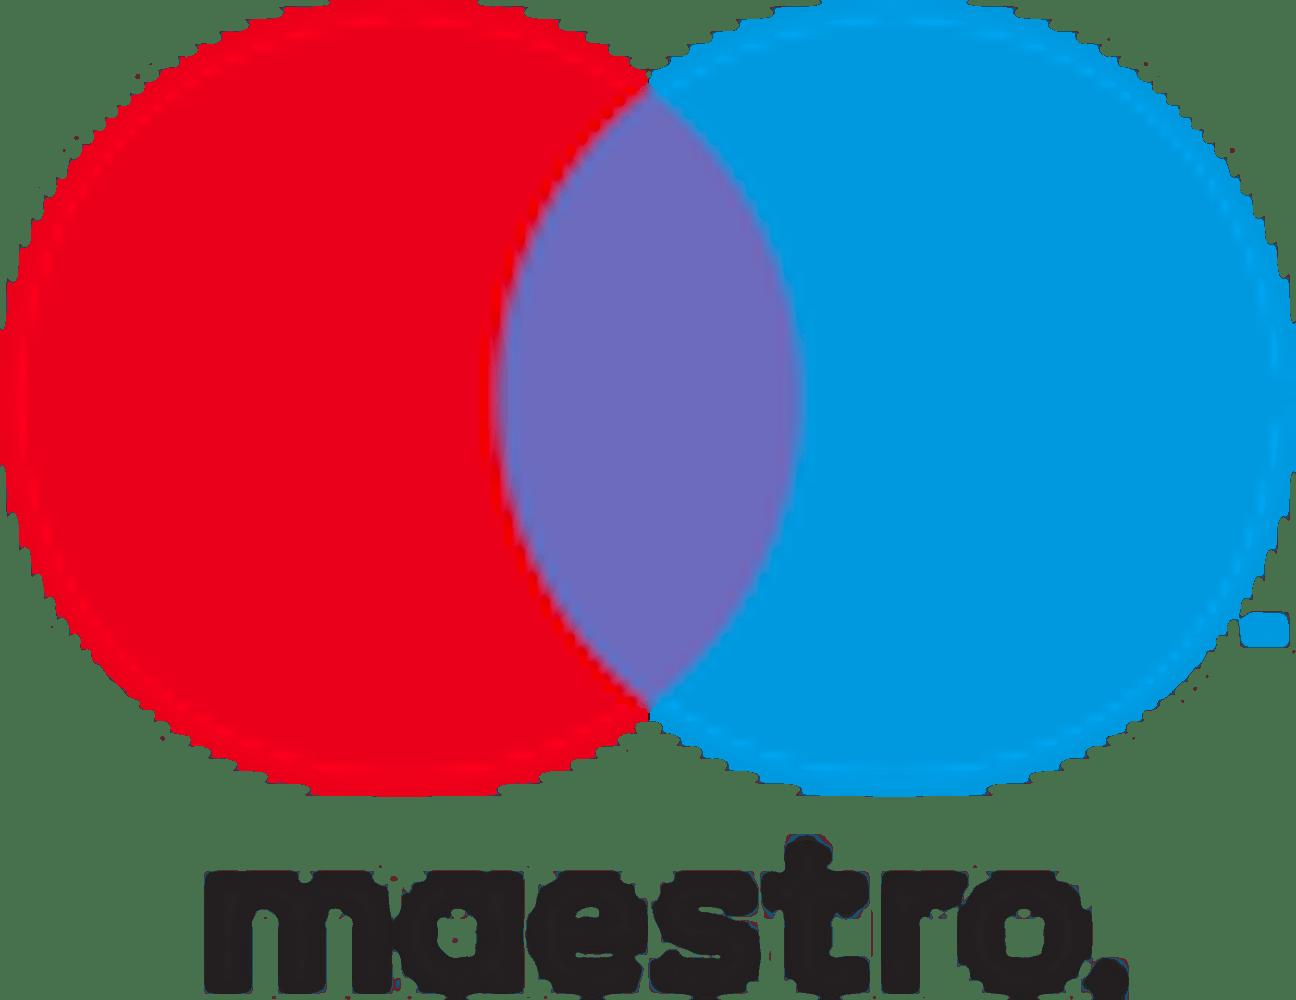 1280-px-maestro-2016-svg@3x